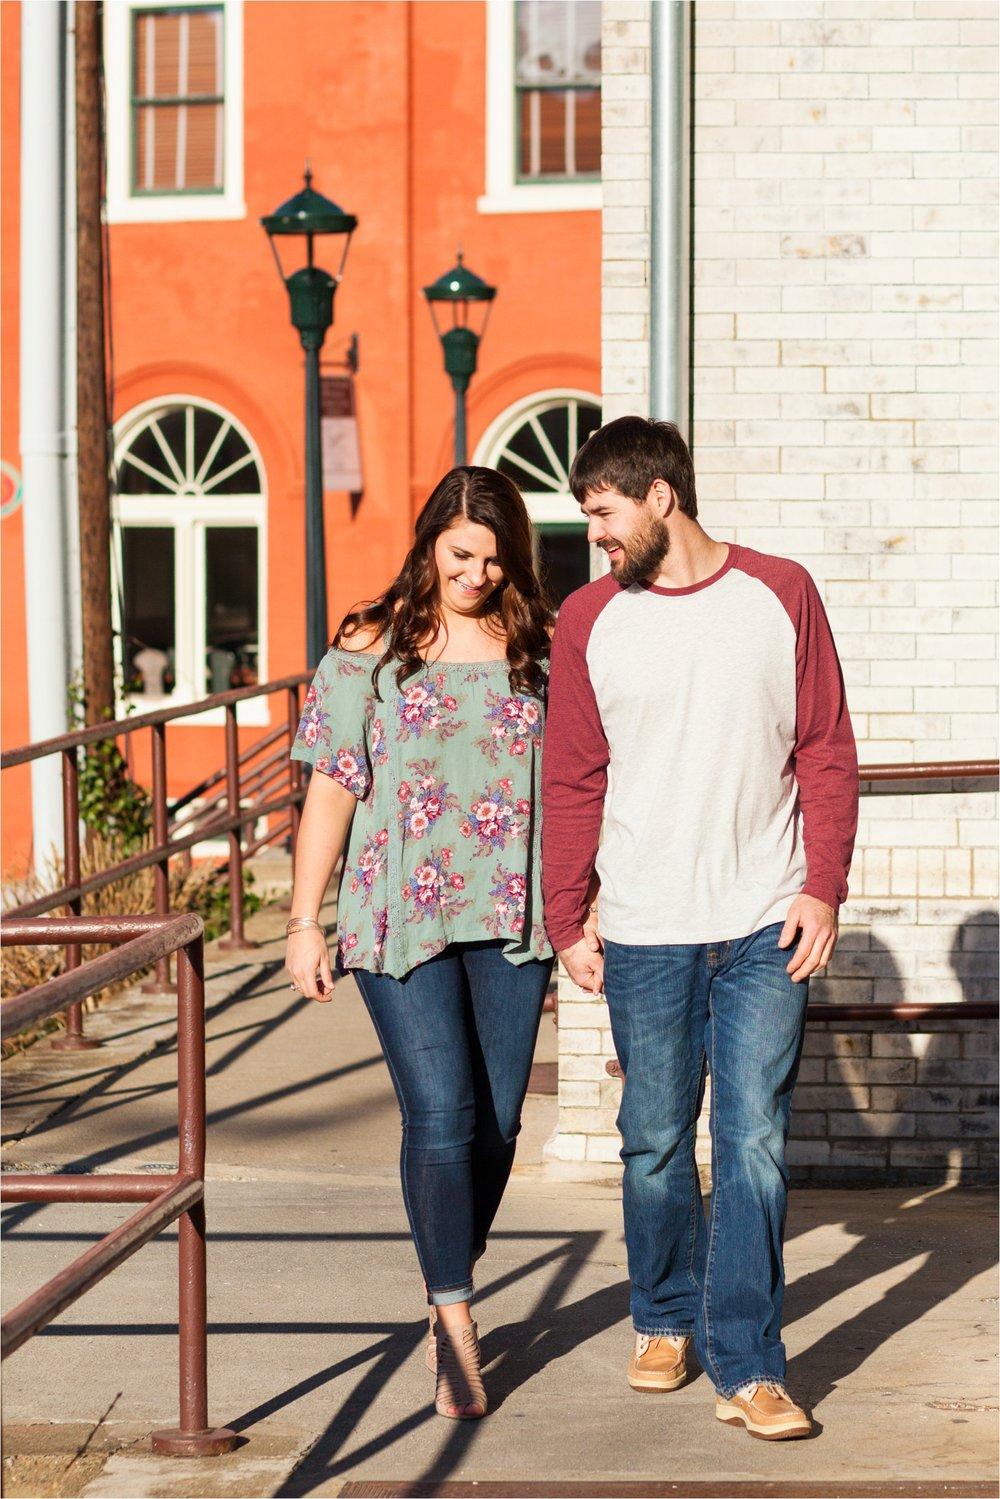 Downtown-Staunton-VA-Spring-Engagement-Session-2901.jpg